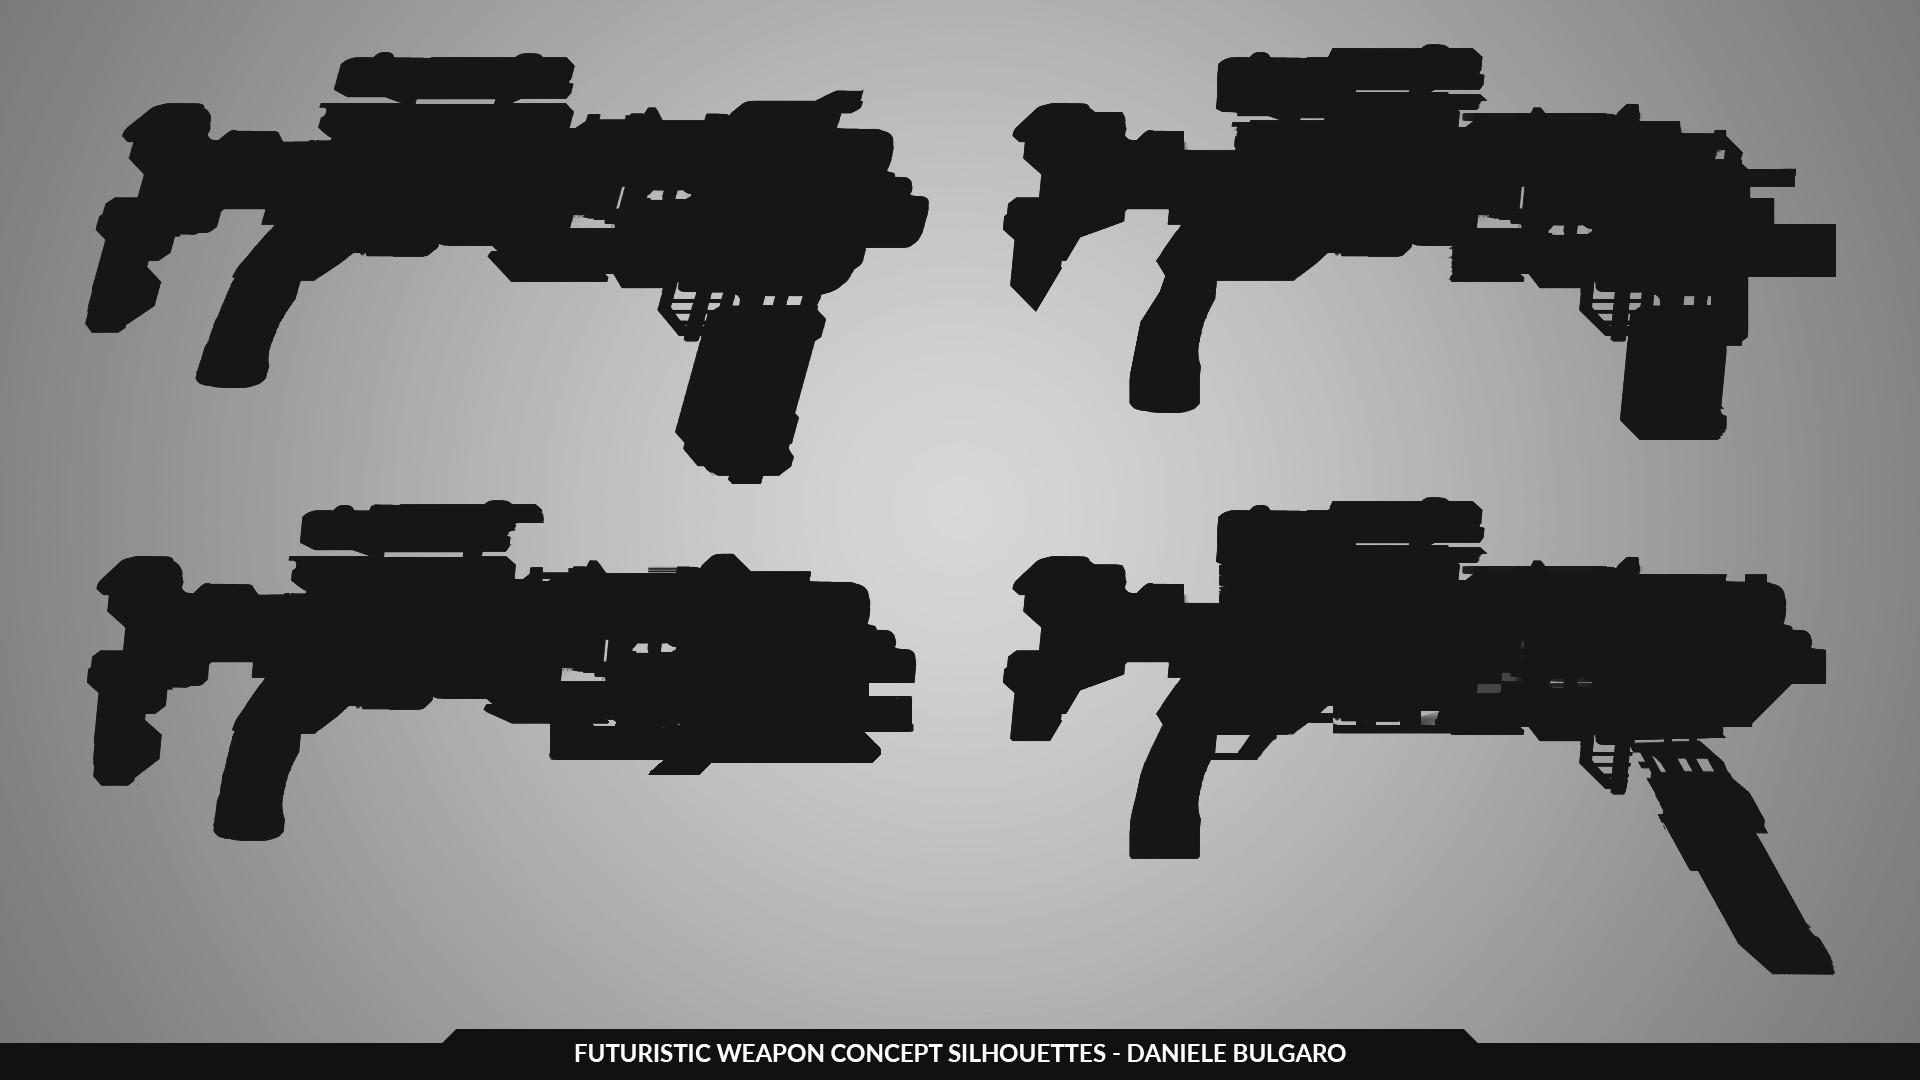 Daniele bulgaro weapon silhouettes danbulgaro